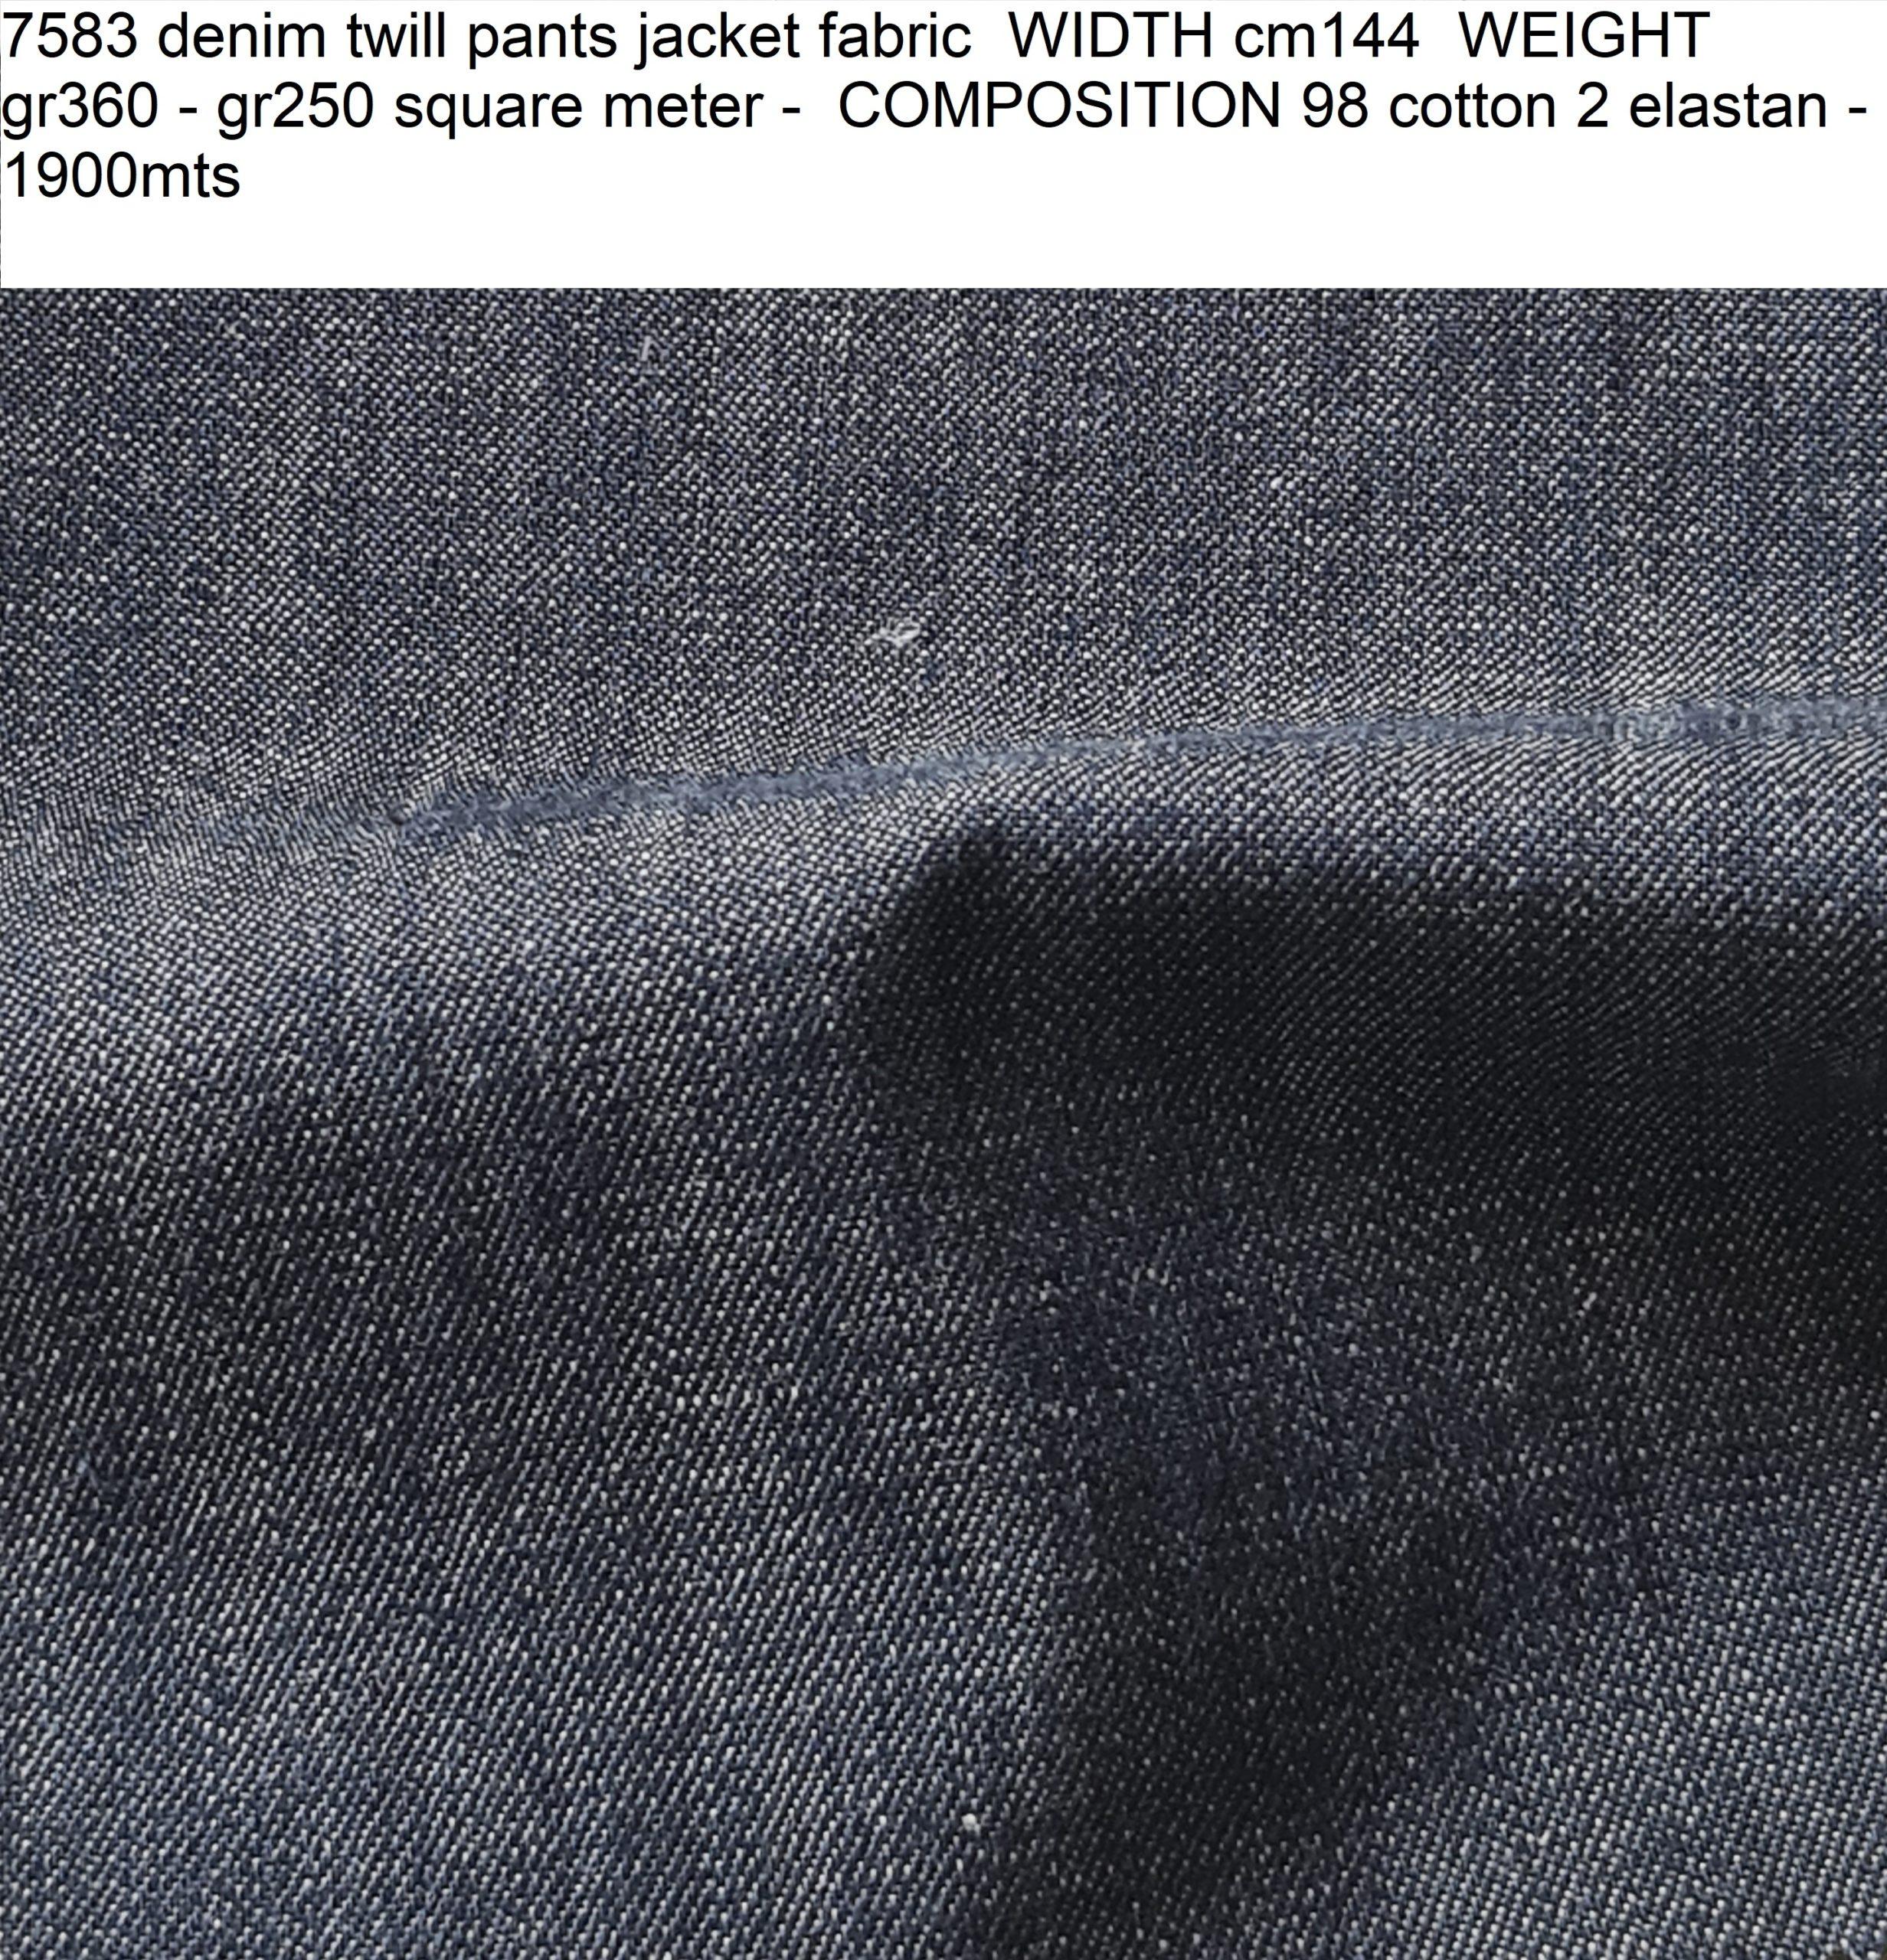 7583 denim twill pants jacket fabric WIDTH cm144 WEIGHT gr360 - gr250 square meter - COMPOSITION 98 cotton 2 elastan - 1900mts